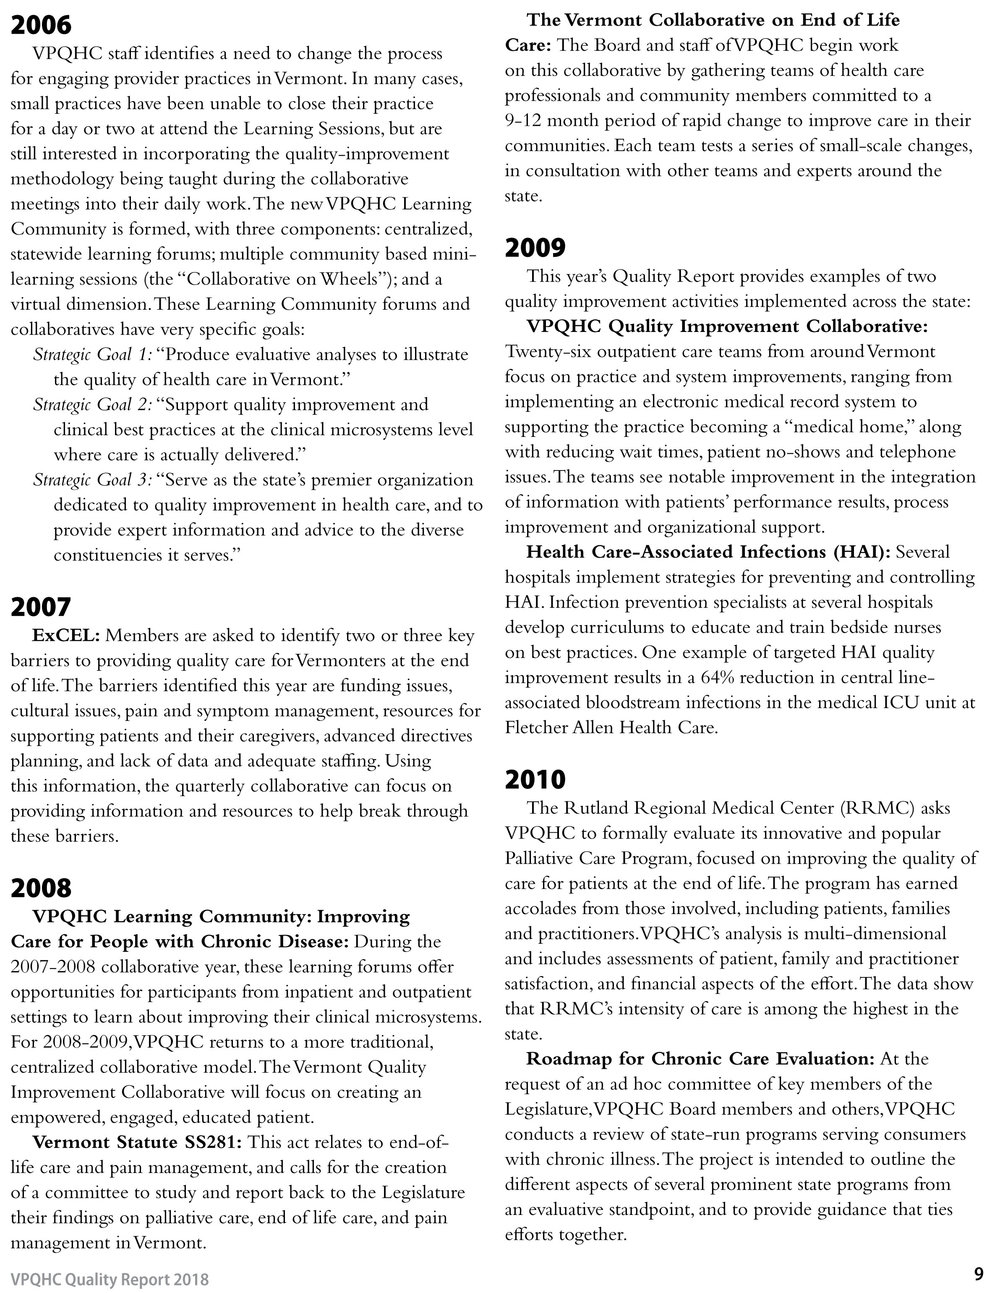 Timeline6.JPG